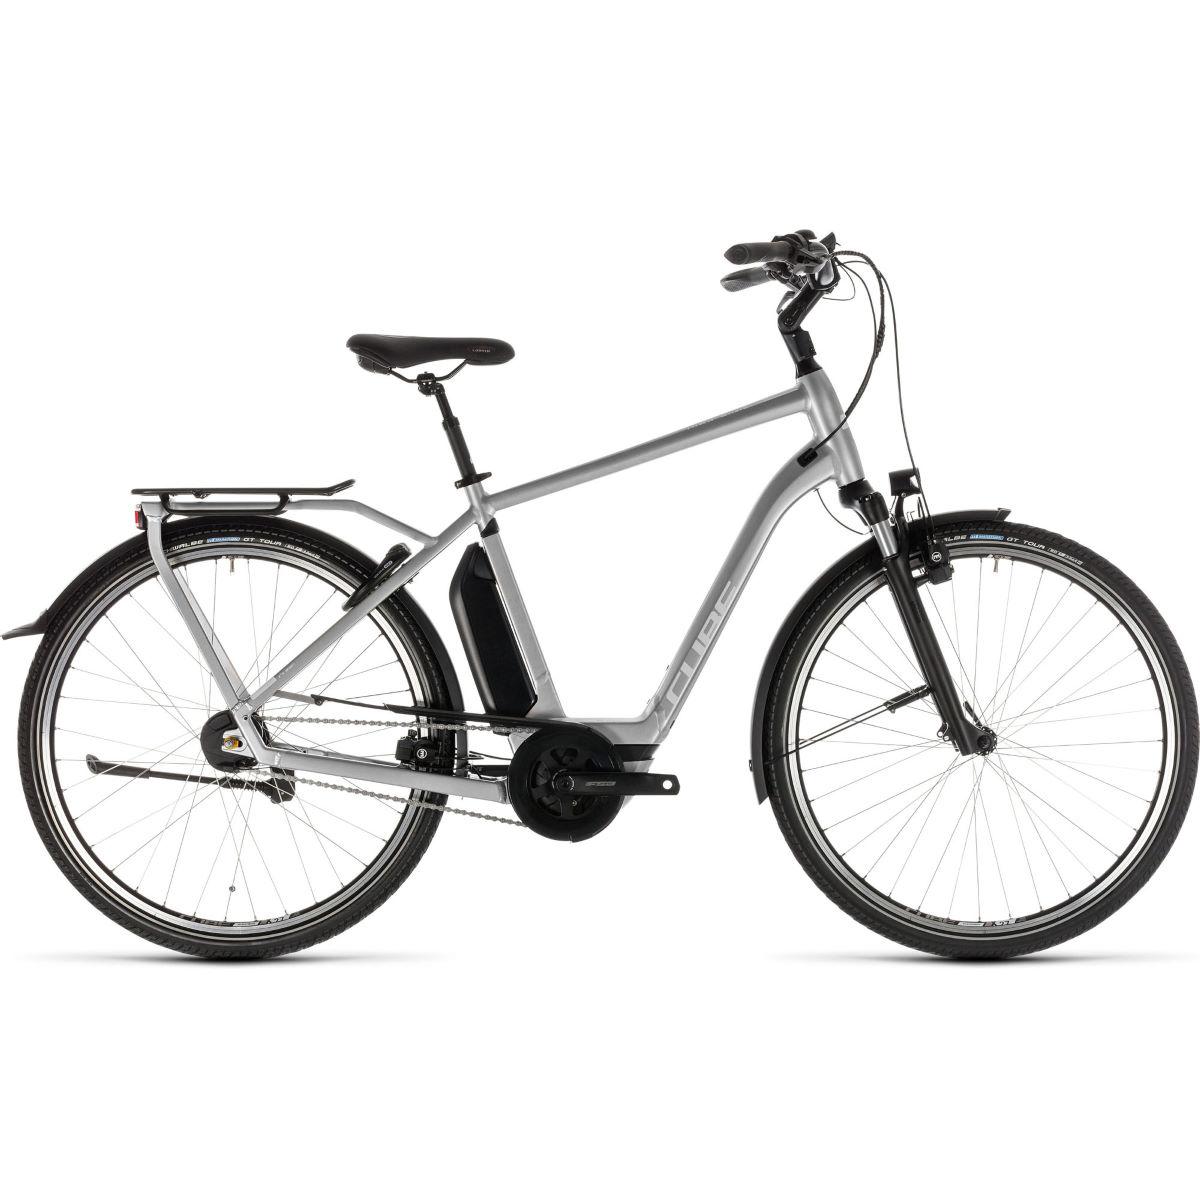 Cube Town SL 500 2019 Electric Urban Bikes